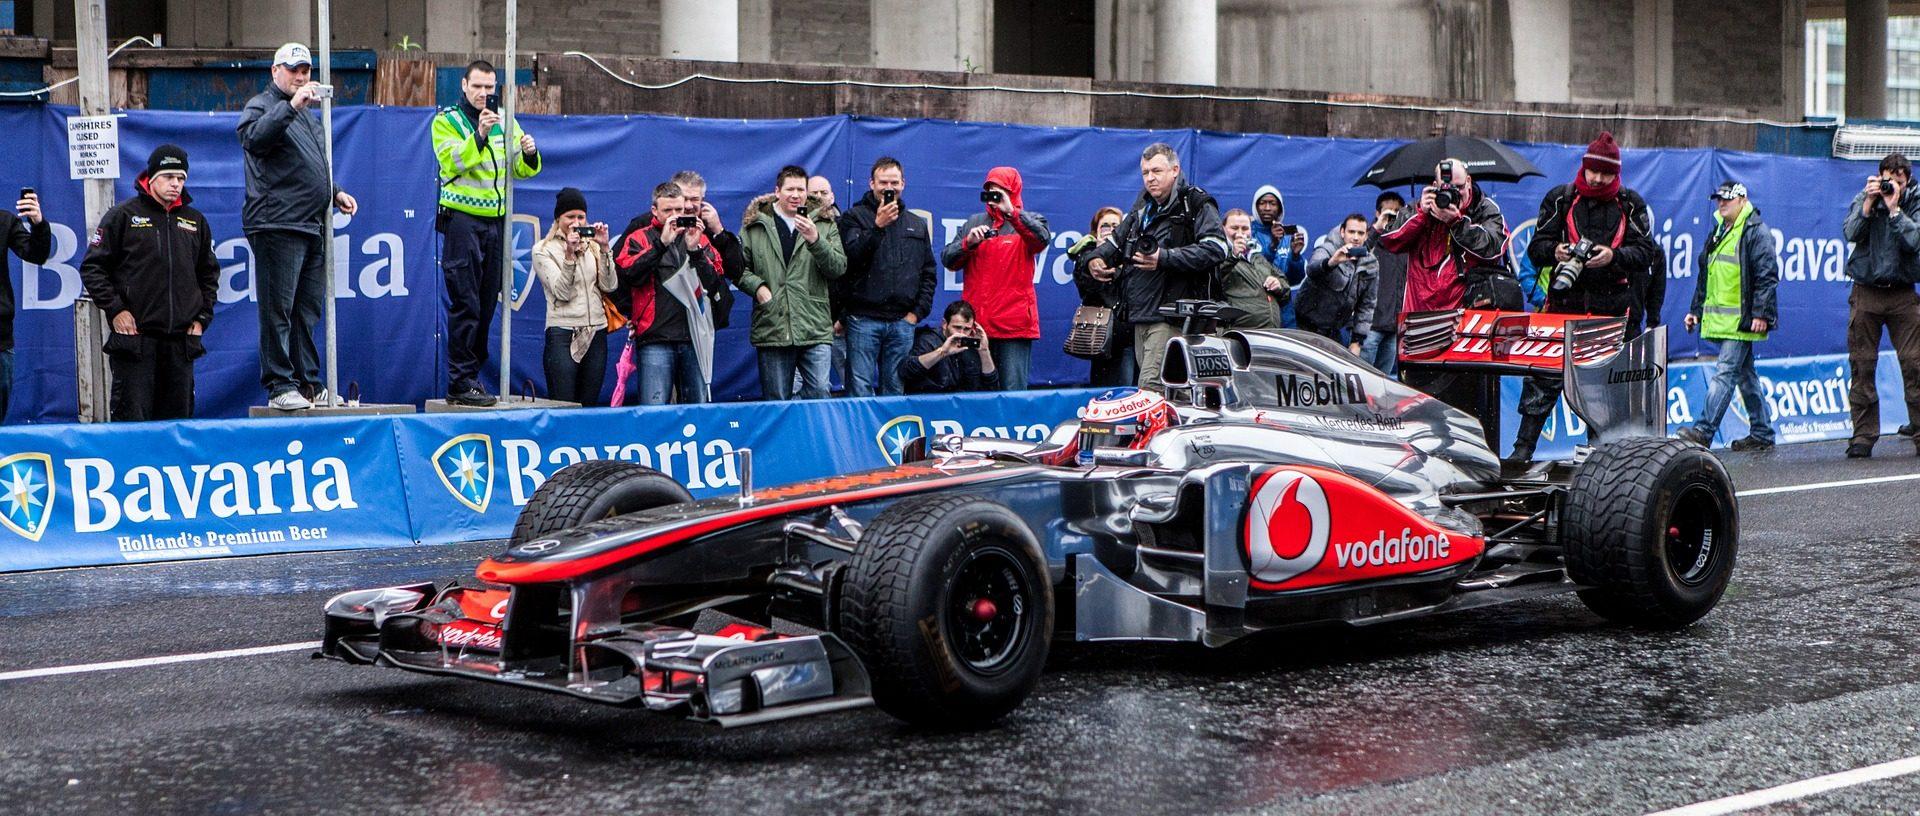 fórmula 1, carro, Corrida, Jenson button, velocidade - Papéis de parede HD - Professor-falken.com